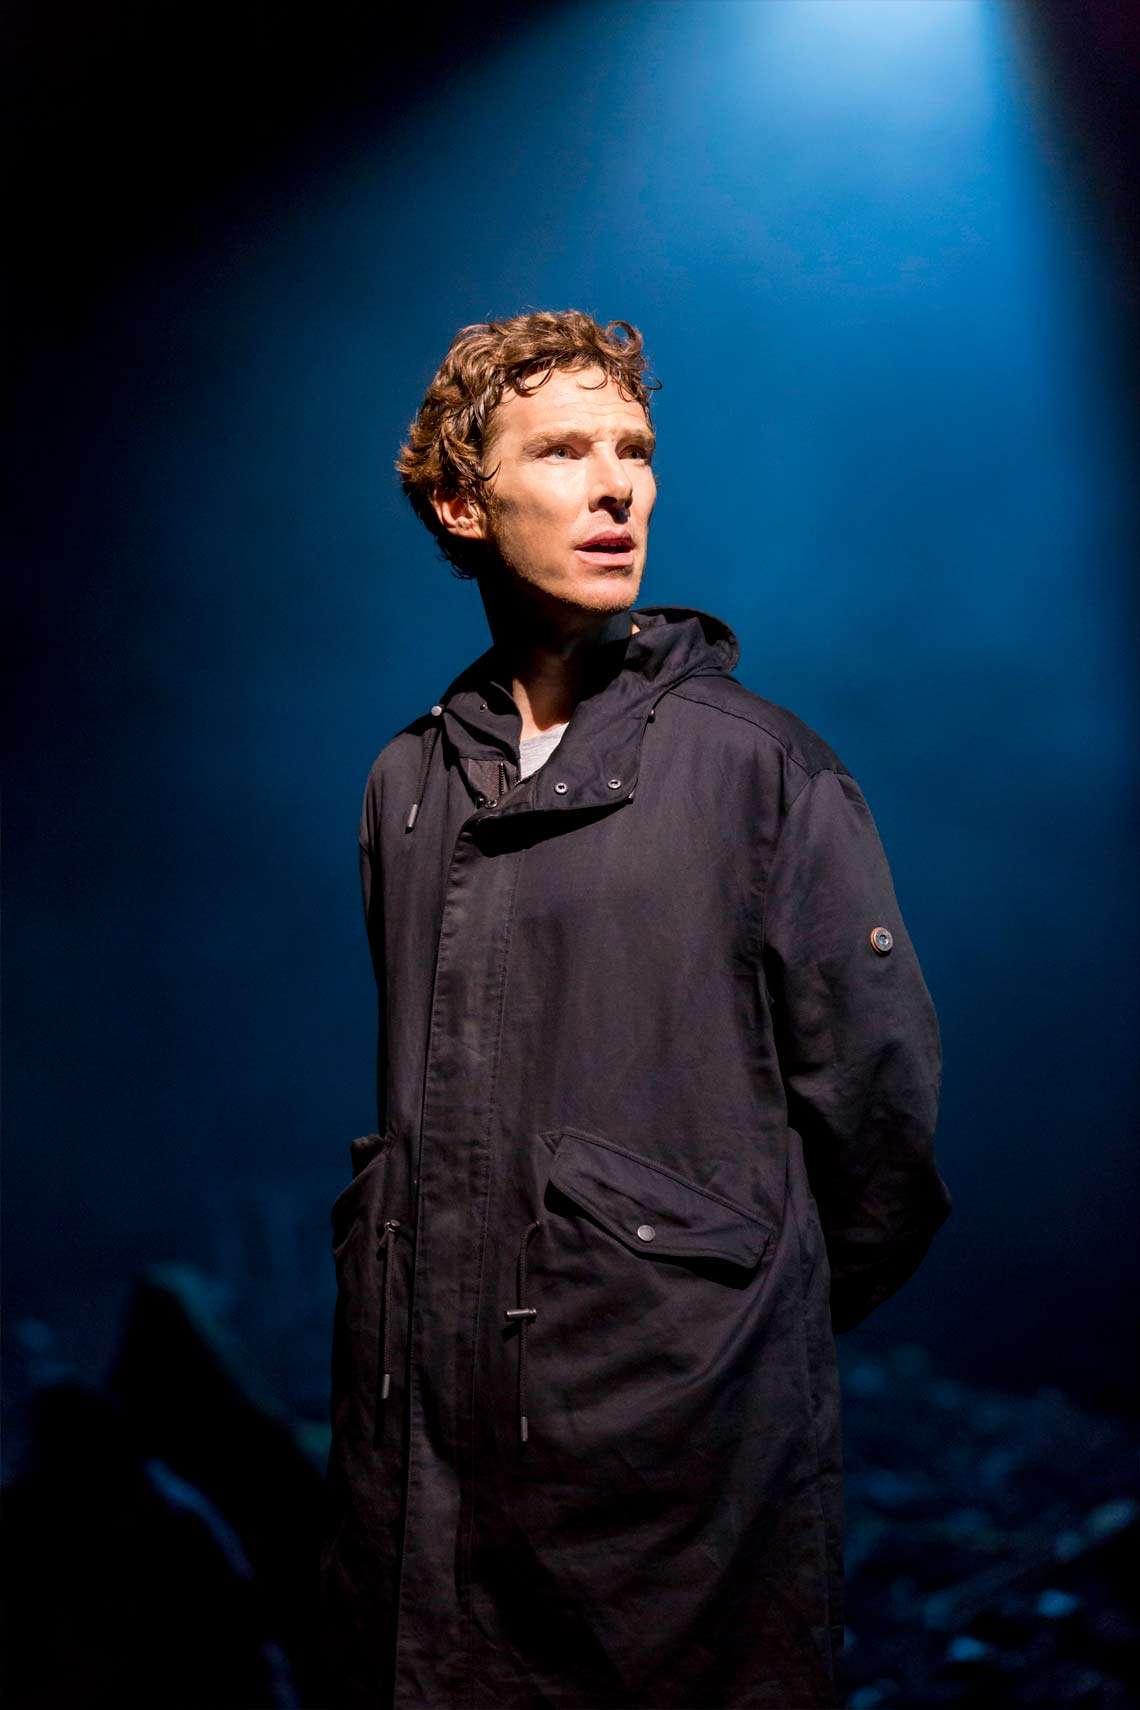 Benedict Cumberbatch|Hamlet |Photo: Johan Persson | Photos: Benedict Cumberbatch in Hamlet at the Barbican